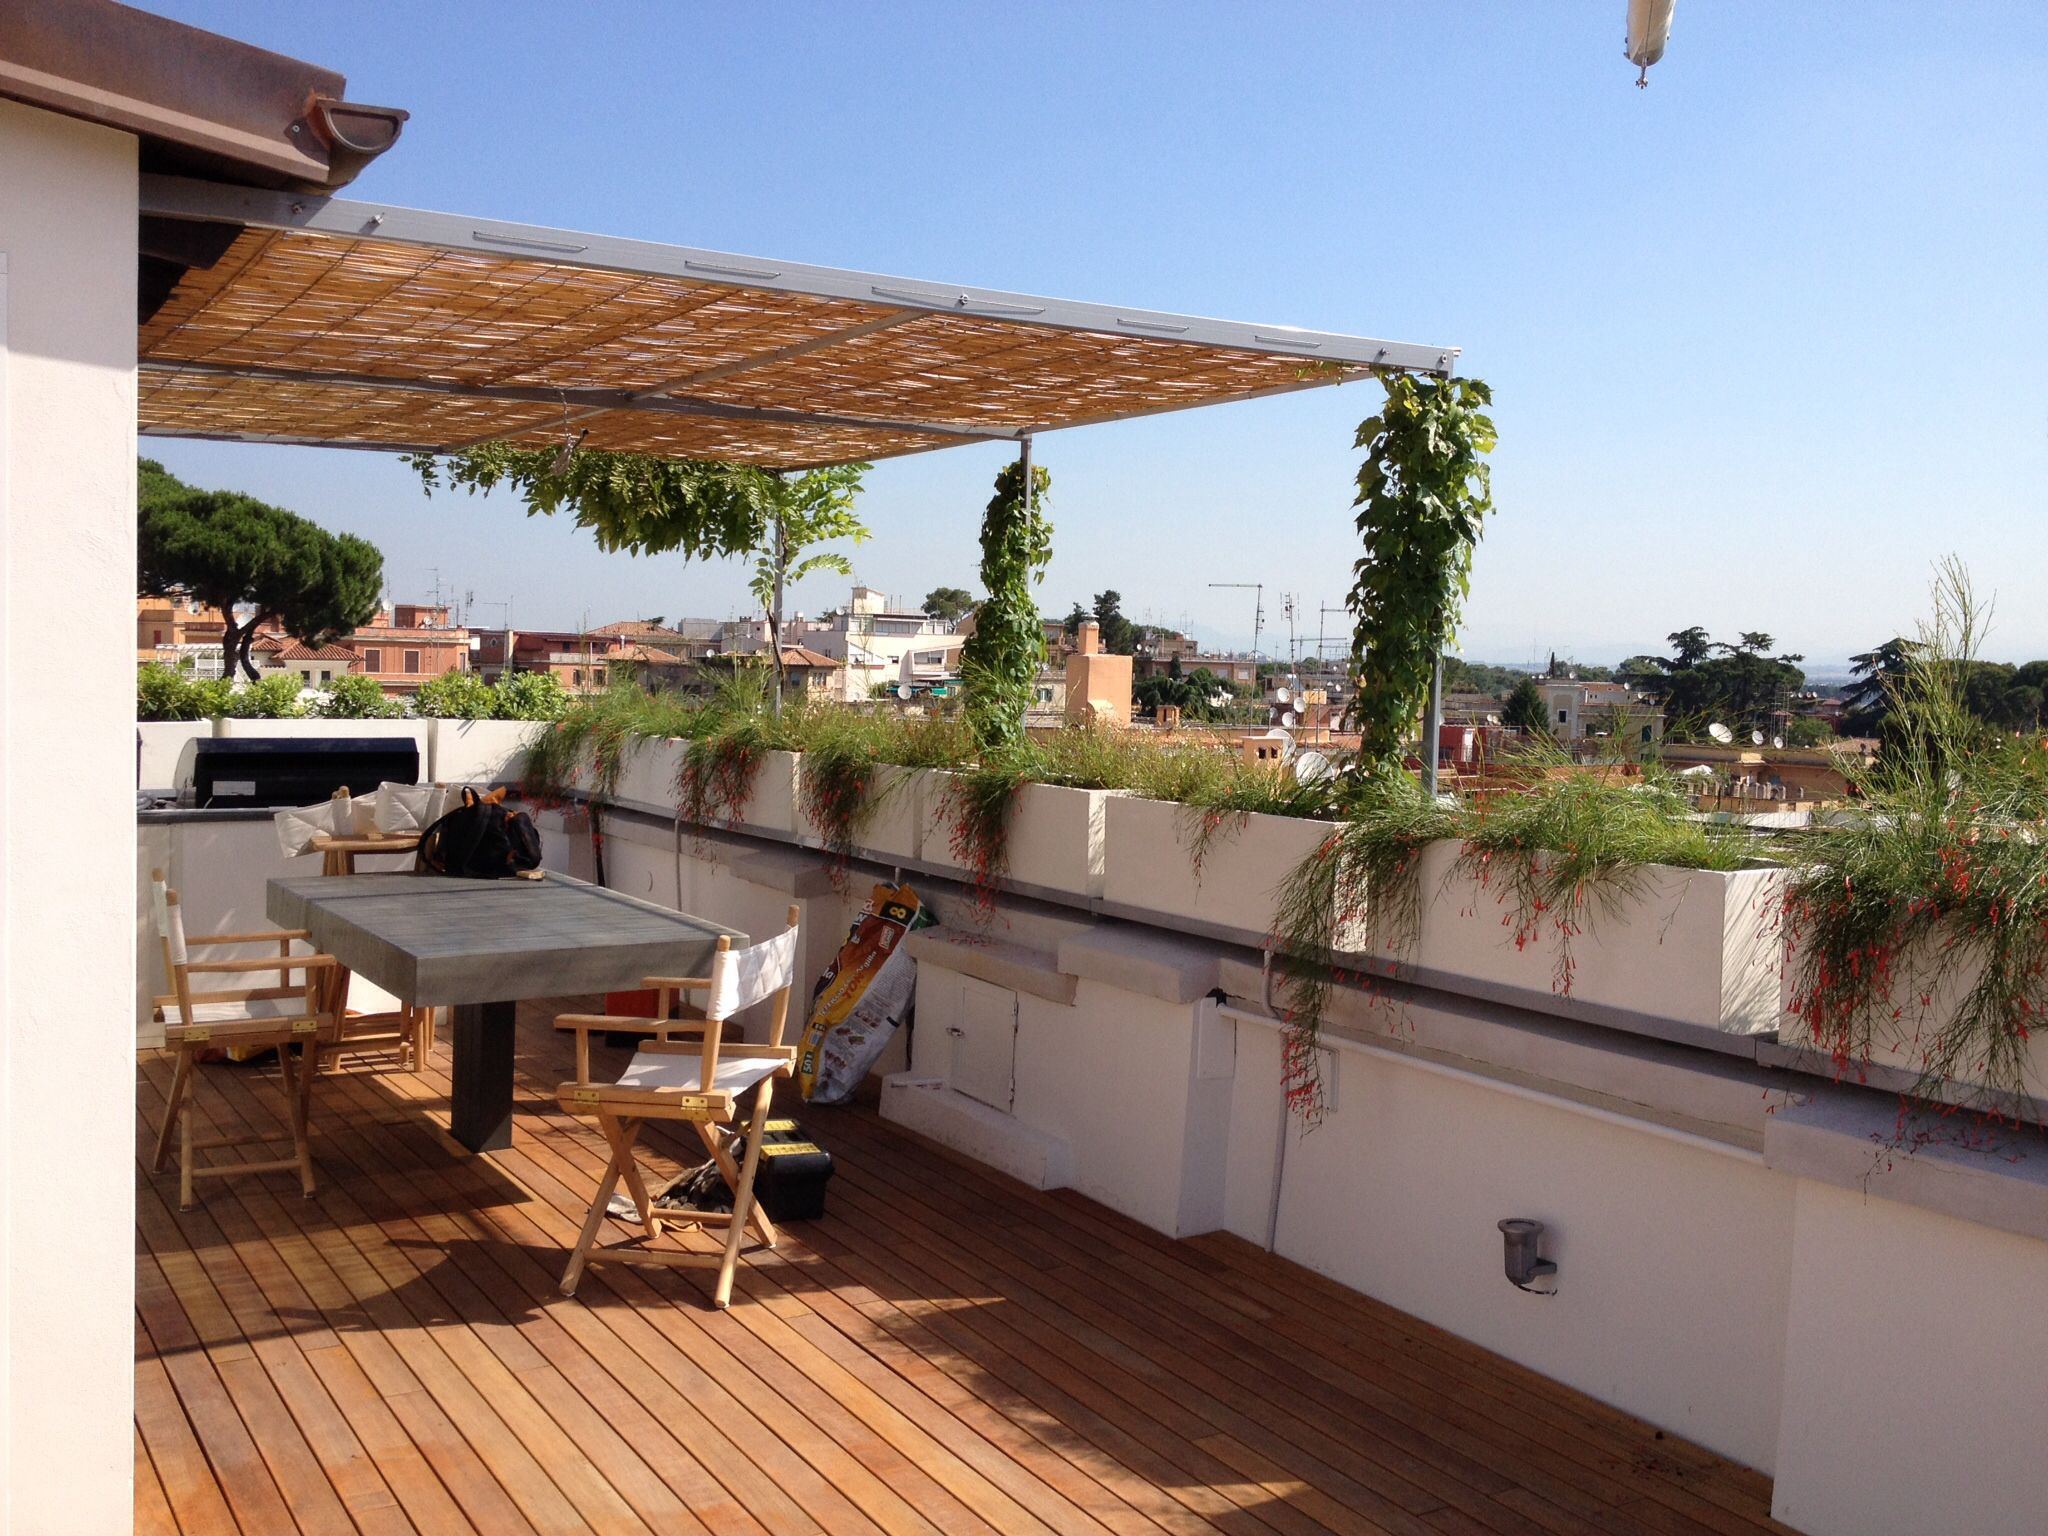 Terrazza romana barca e tavolo   lorenza bartolazzi gardens ...